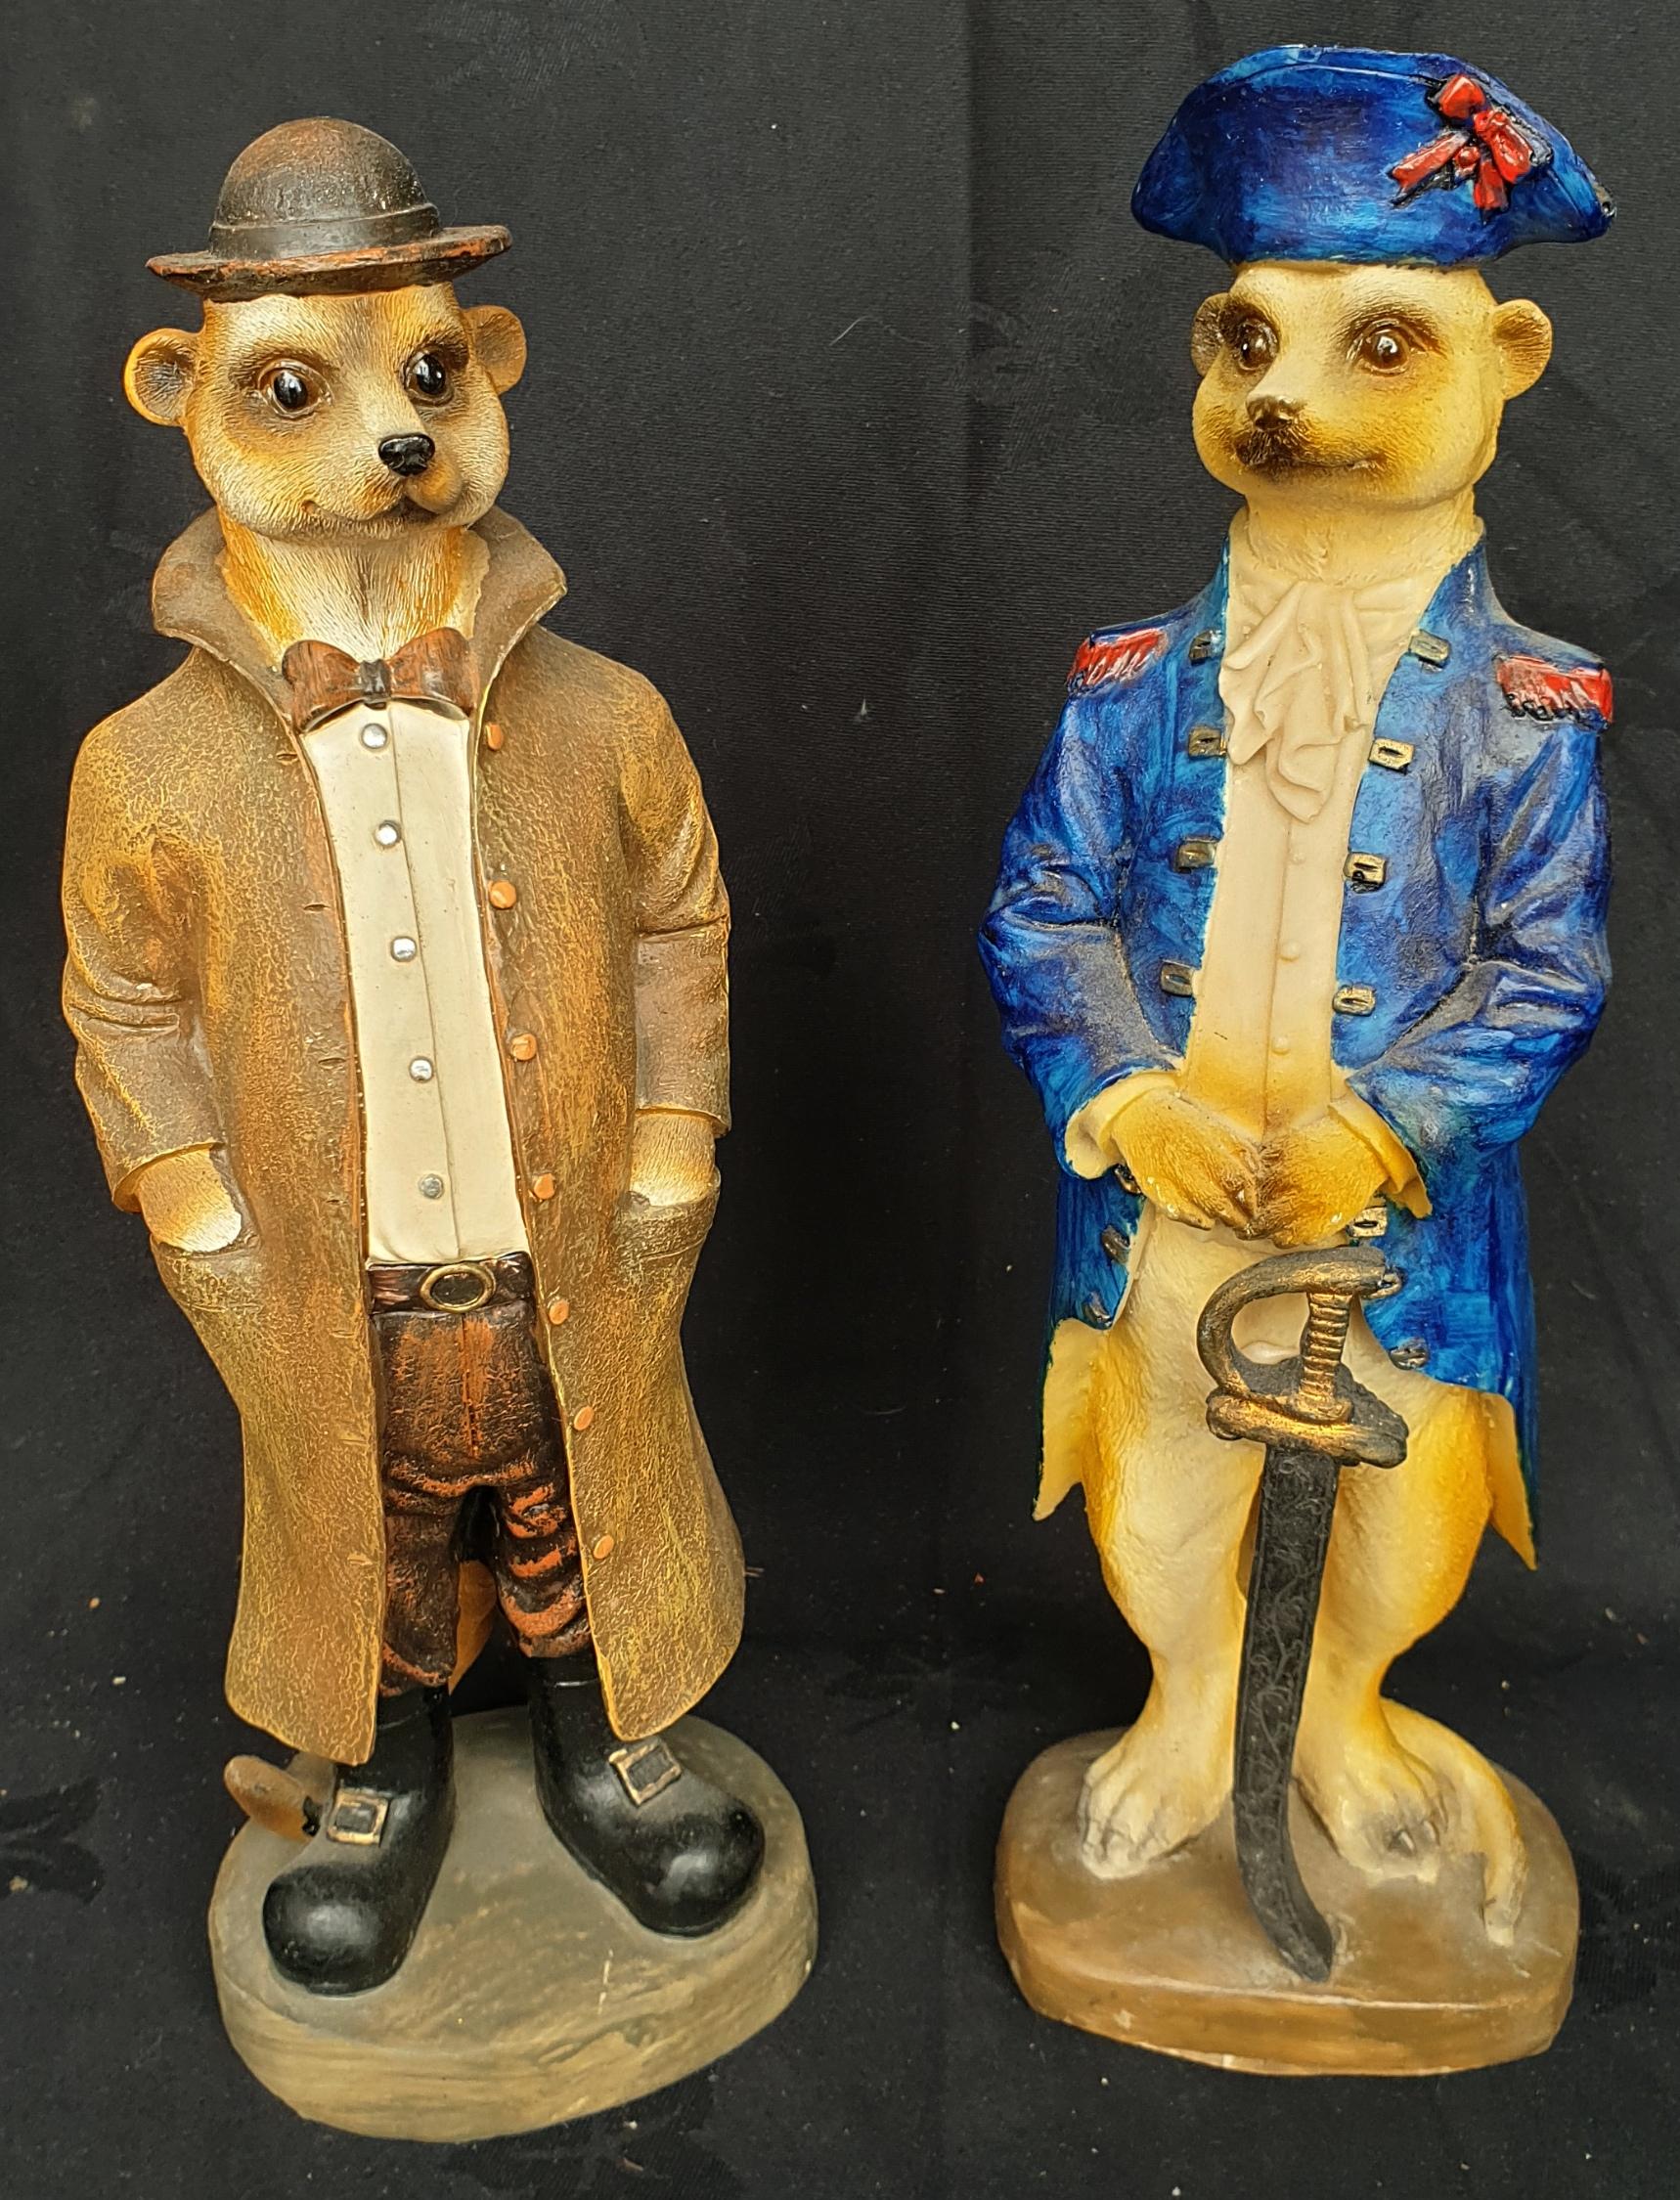 Vintage 2 x Resin Meerkat Figures 13 Inches Tall